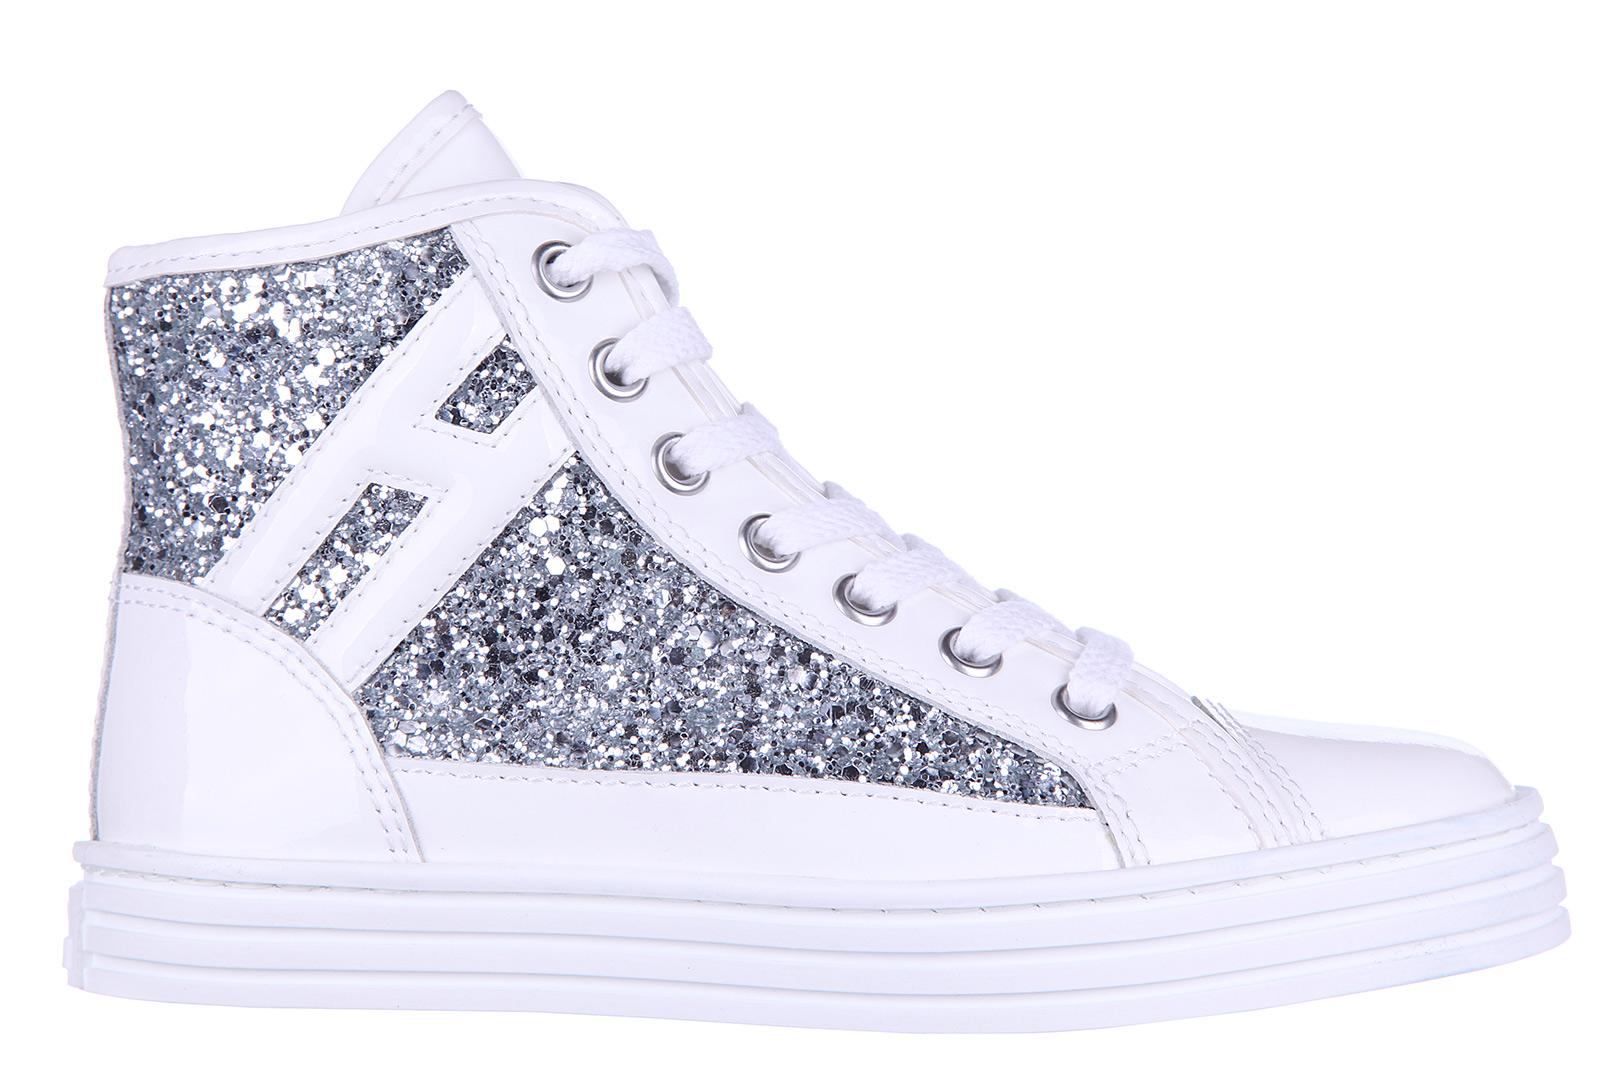 Hogan Rebel Girls Shoes Child Sneakers Alte Pelle R 141 Glitter ...